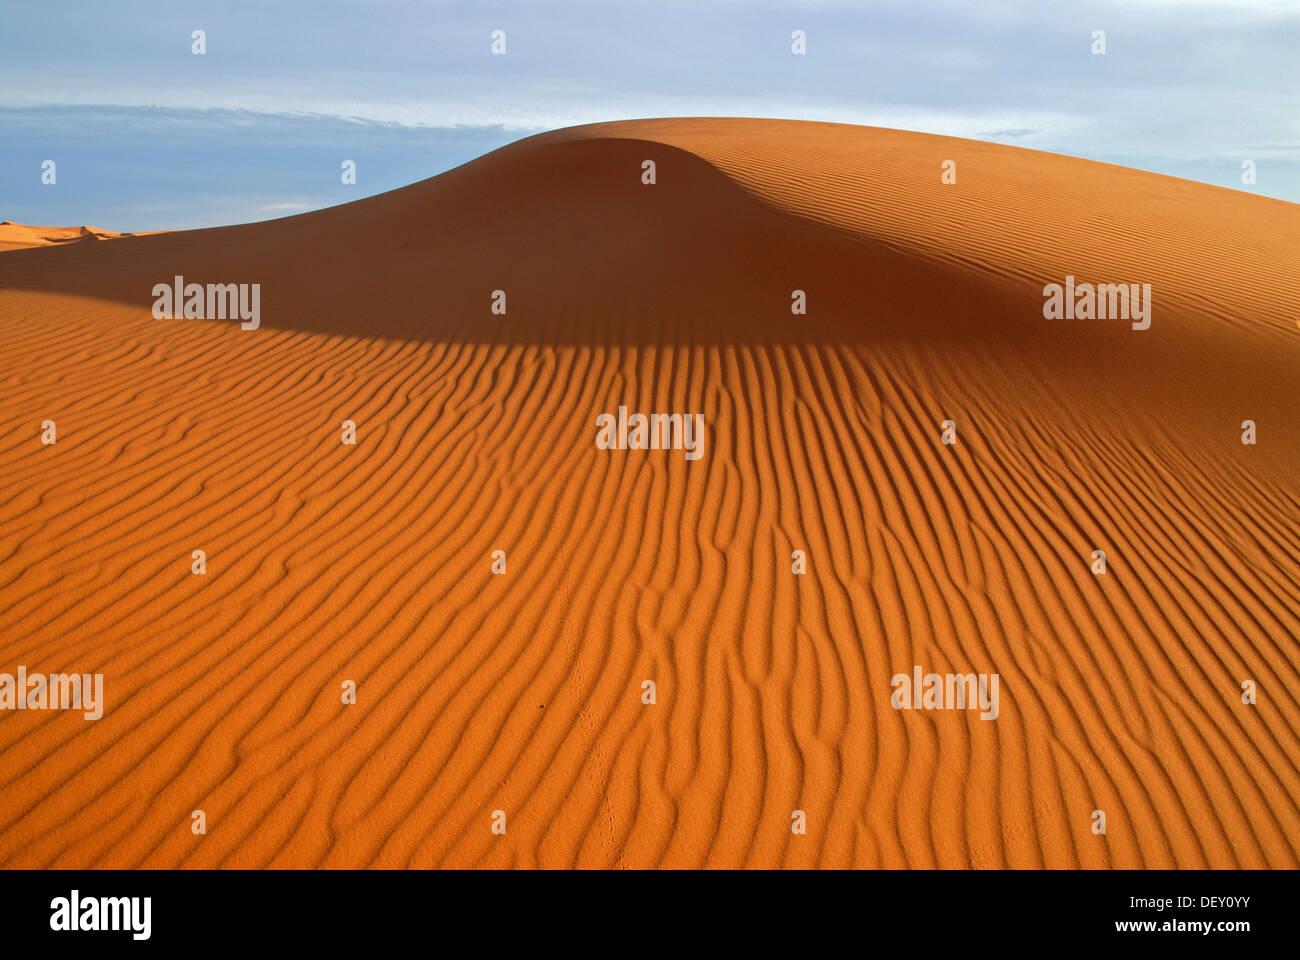 The sand dunes of Erg Chebbi at the western edge of the Sahara desert, Meknès-Tafilalet, Morocco, Africa - Stock Image